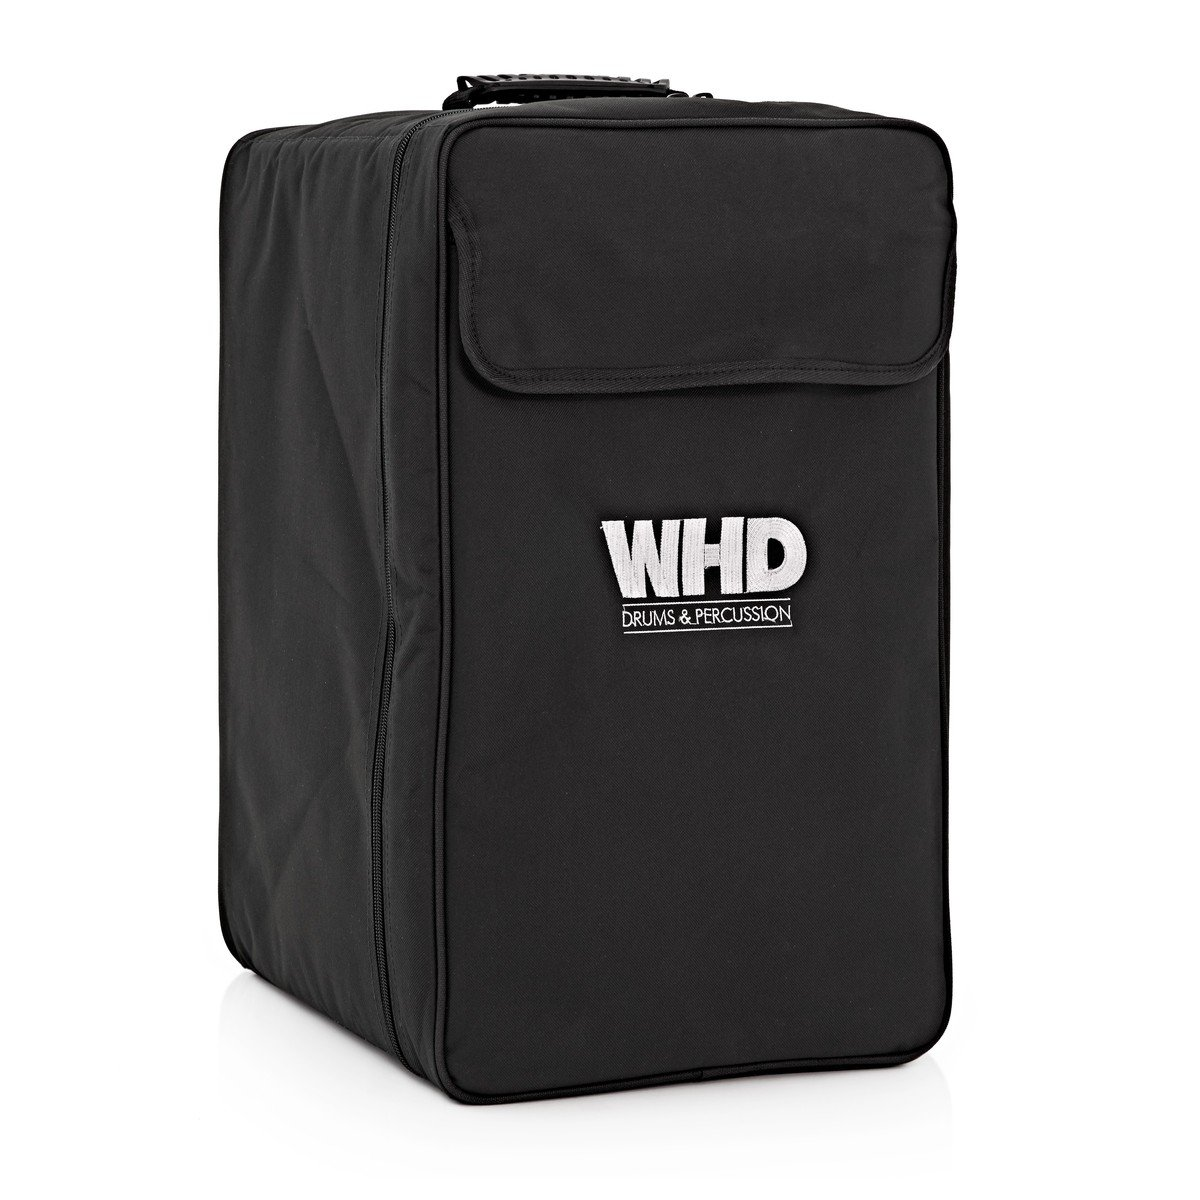 WHD Cajon Finition/Ebene Noir